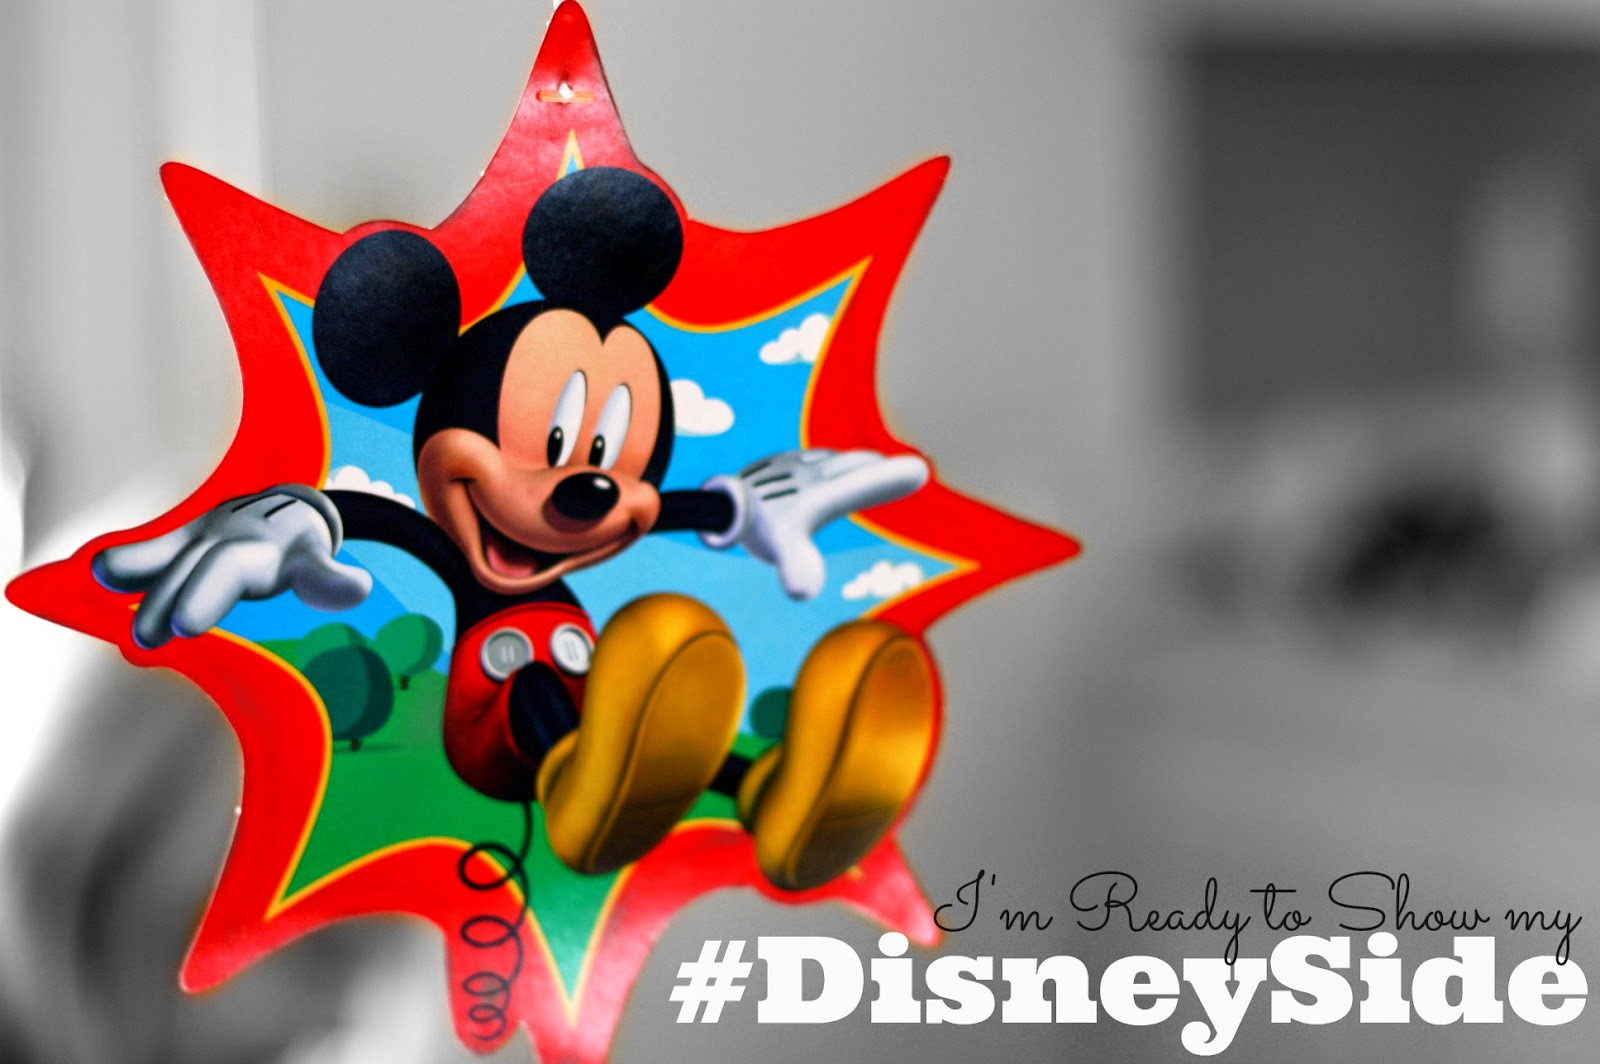 #ad #DisneySide Party